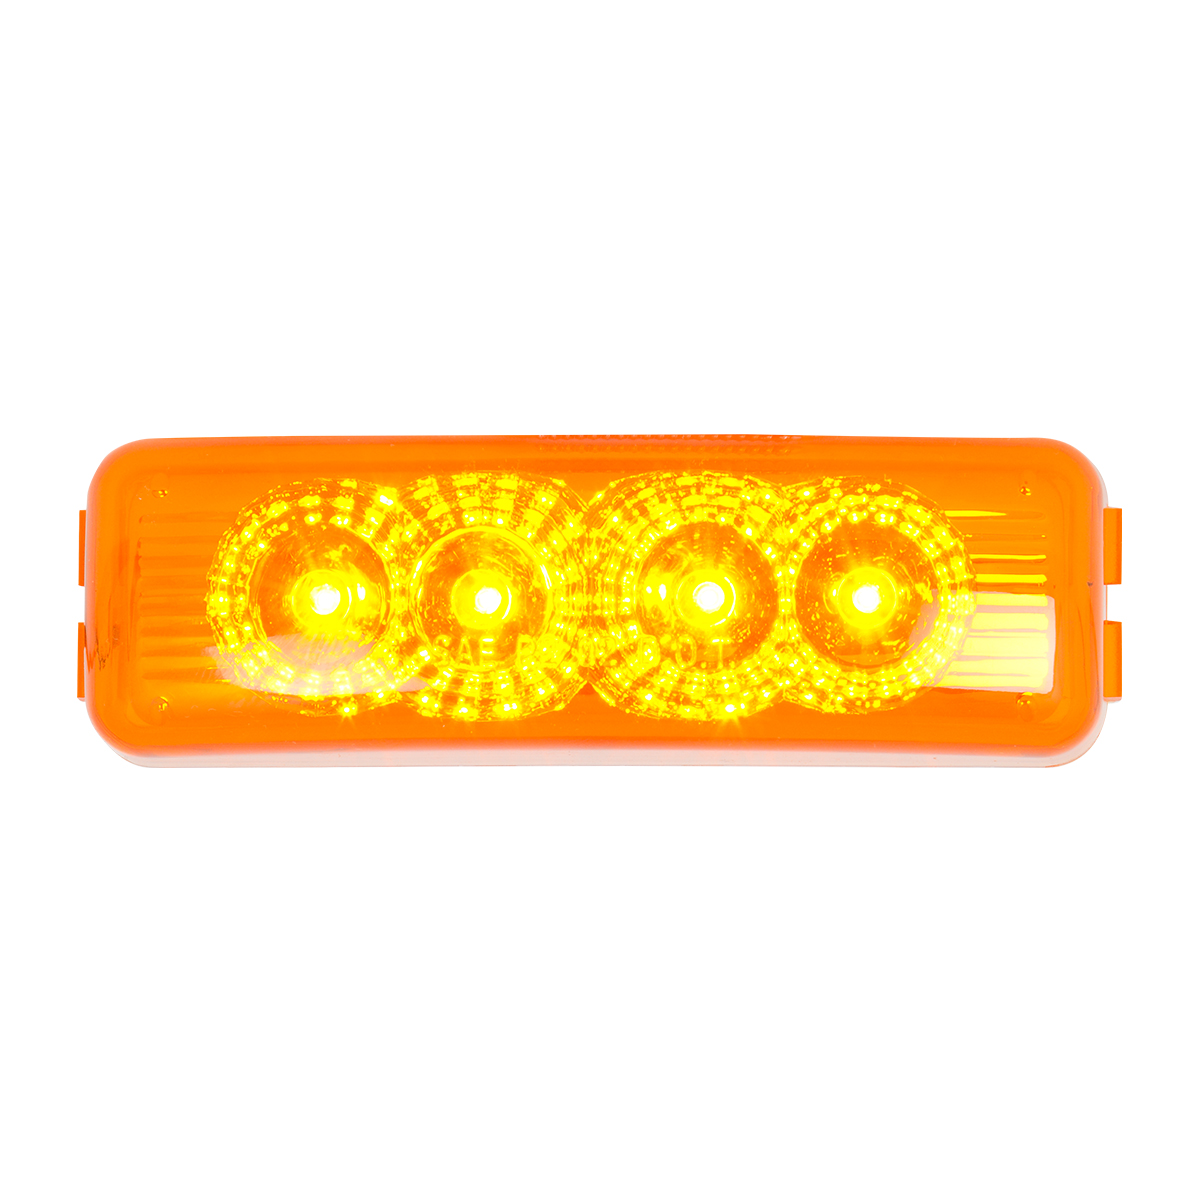 77960 Medium Rectangular Spyder LED Marker Light